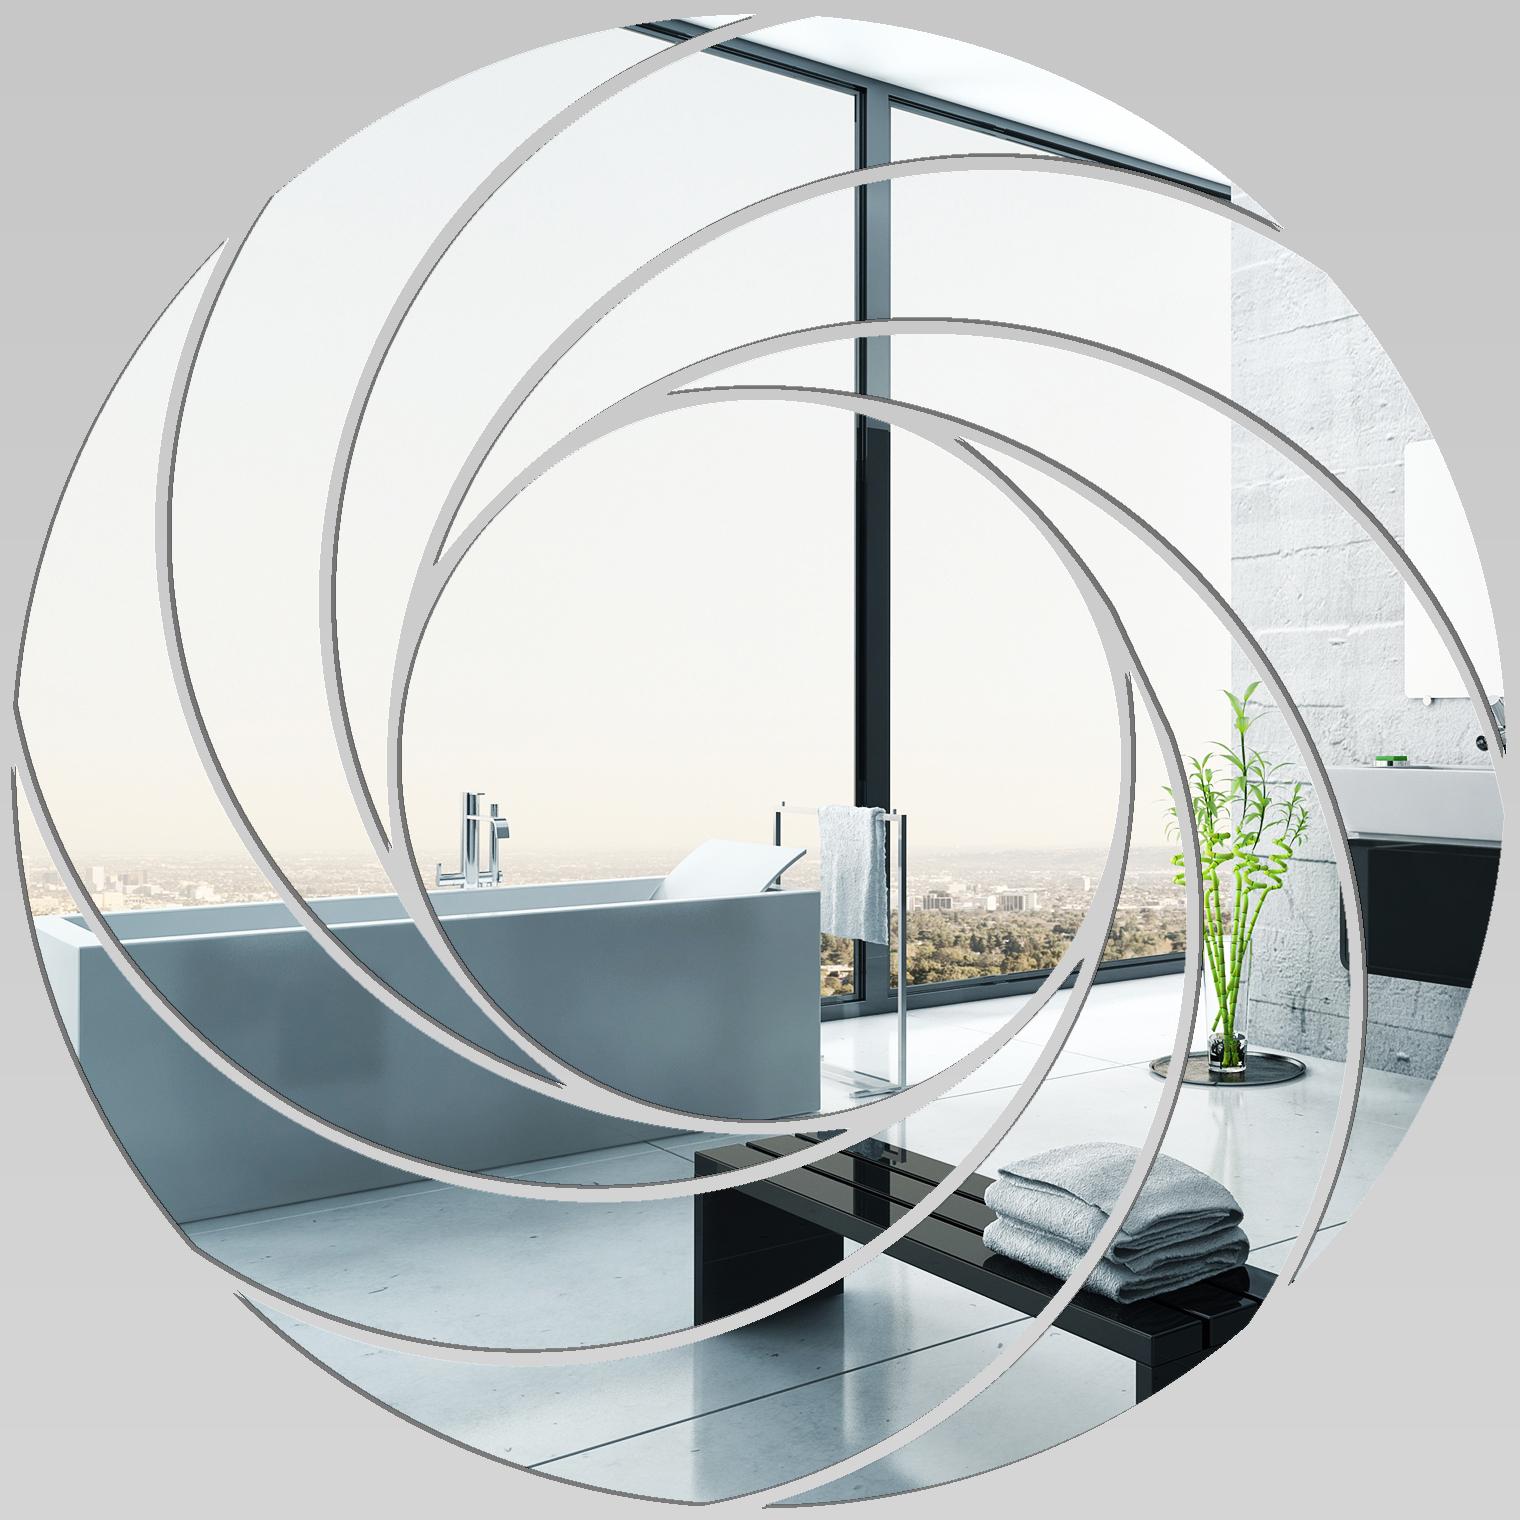 Miroir plexiglass acrylique spirales design 5 pas cher for Miroir 80x80